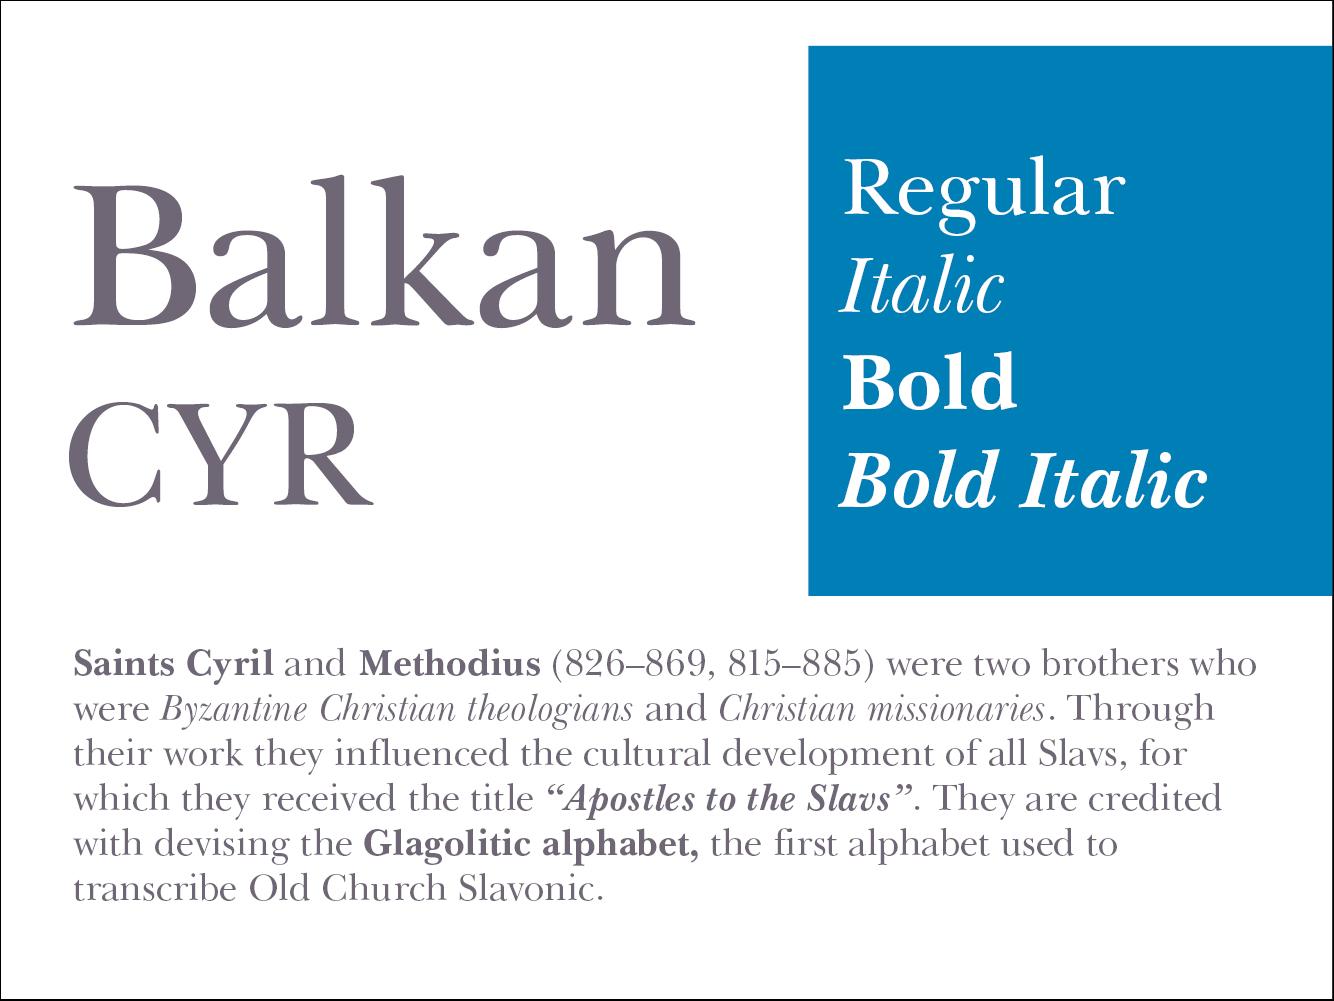 Balkan CYR